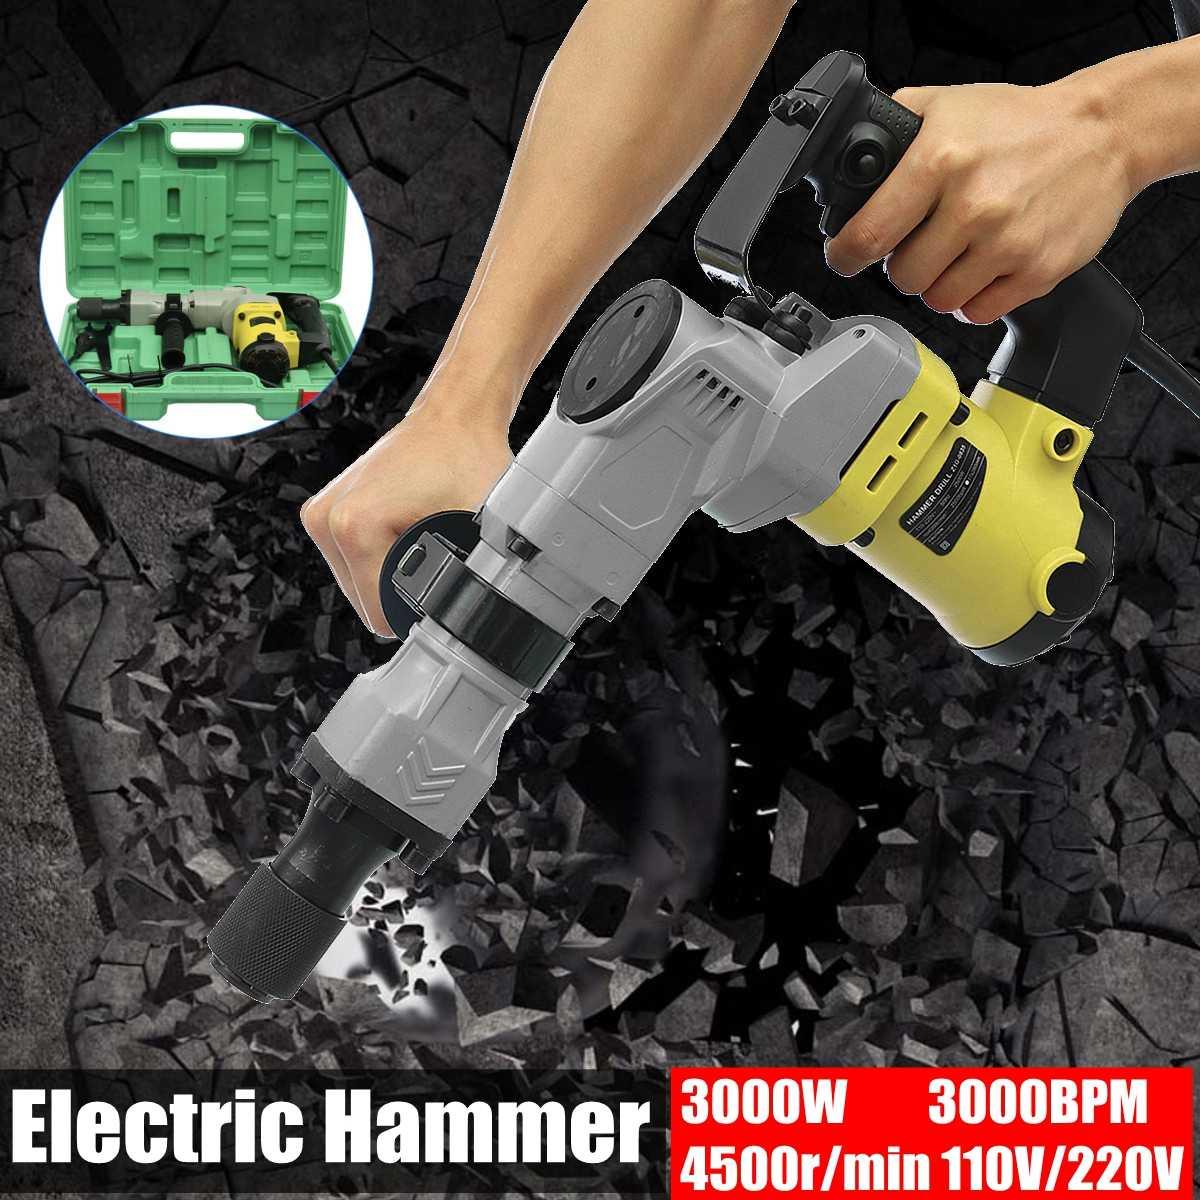 220V 3000W 3000BPM 4500R/Min Electric Hammer Demolition Hammers Jackhammer Concrete Breaker With Case220V 3000W 3000BPM 4500R/Min Electric Hammer Demolition Hammers Jackhammer Concrete Breaker With Case